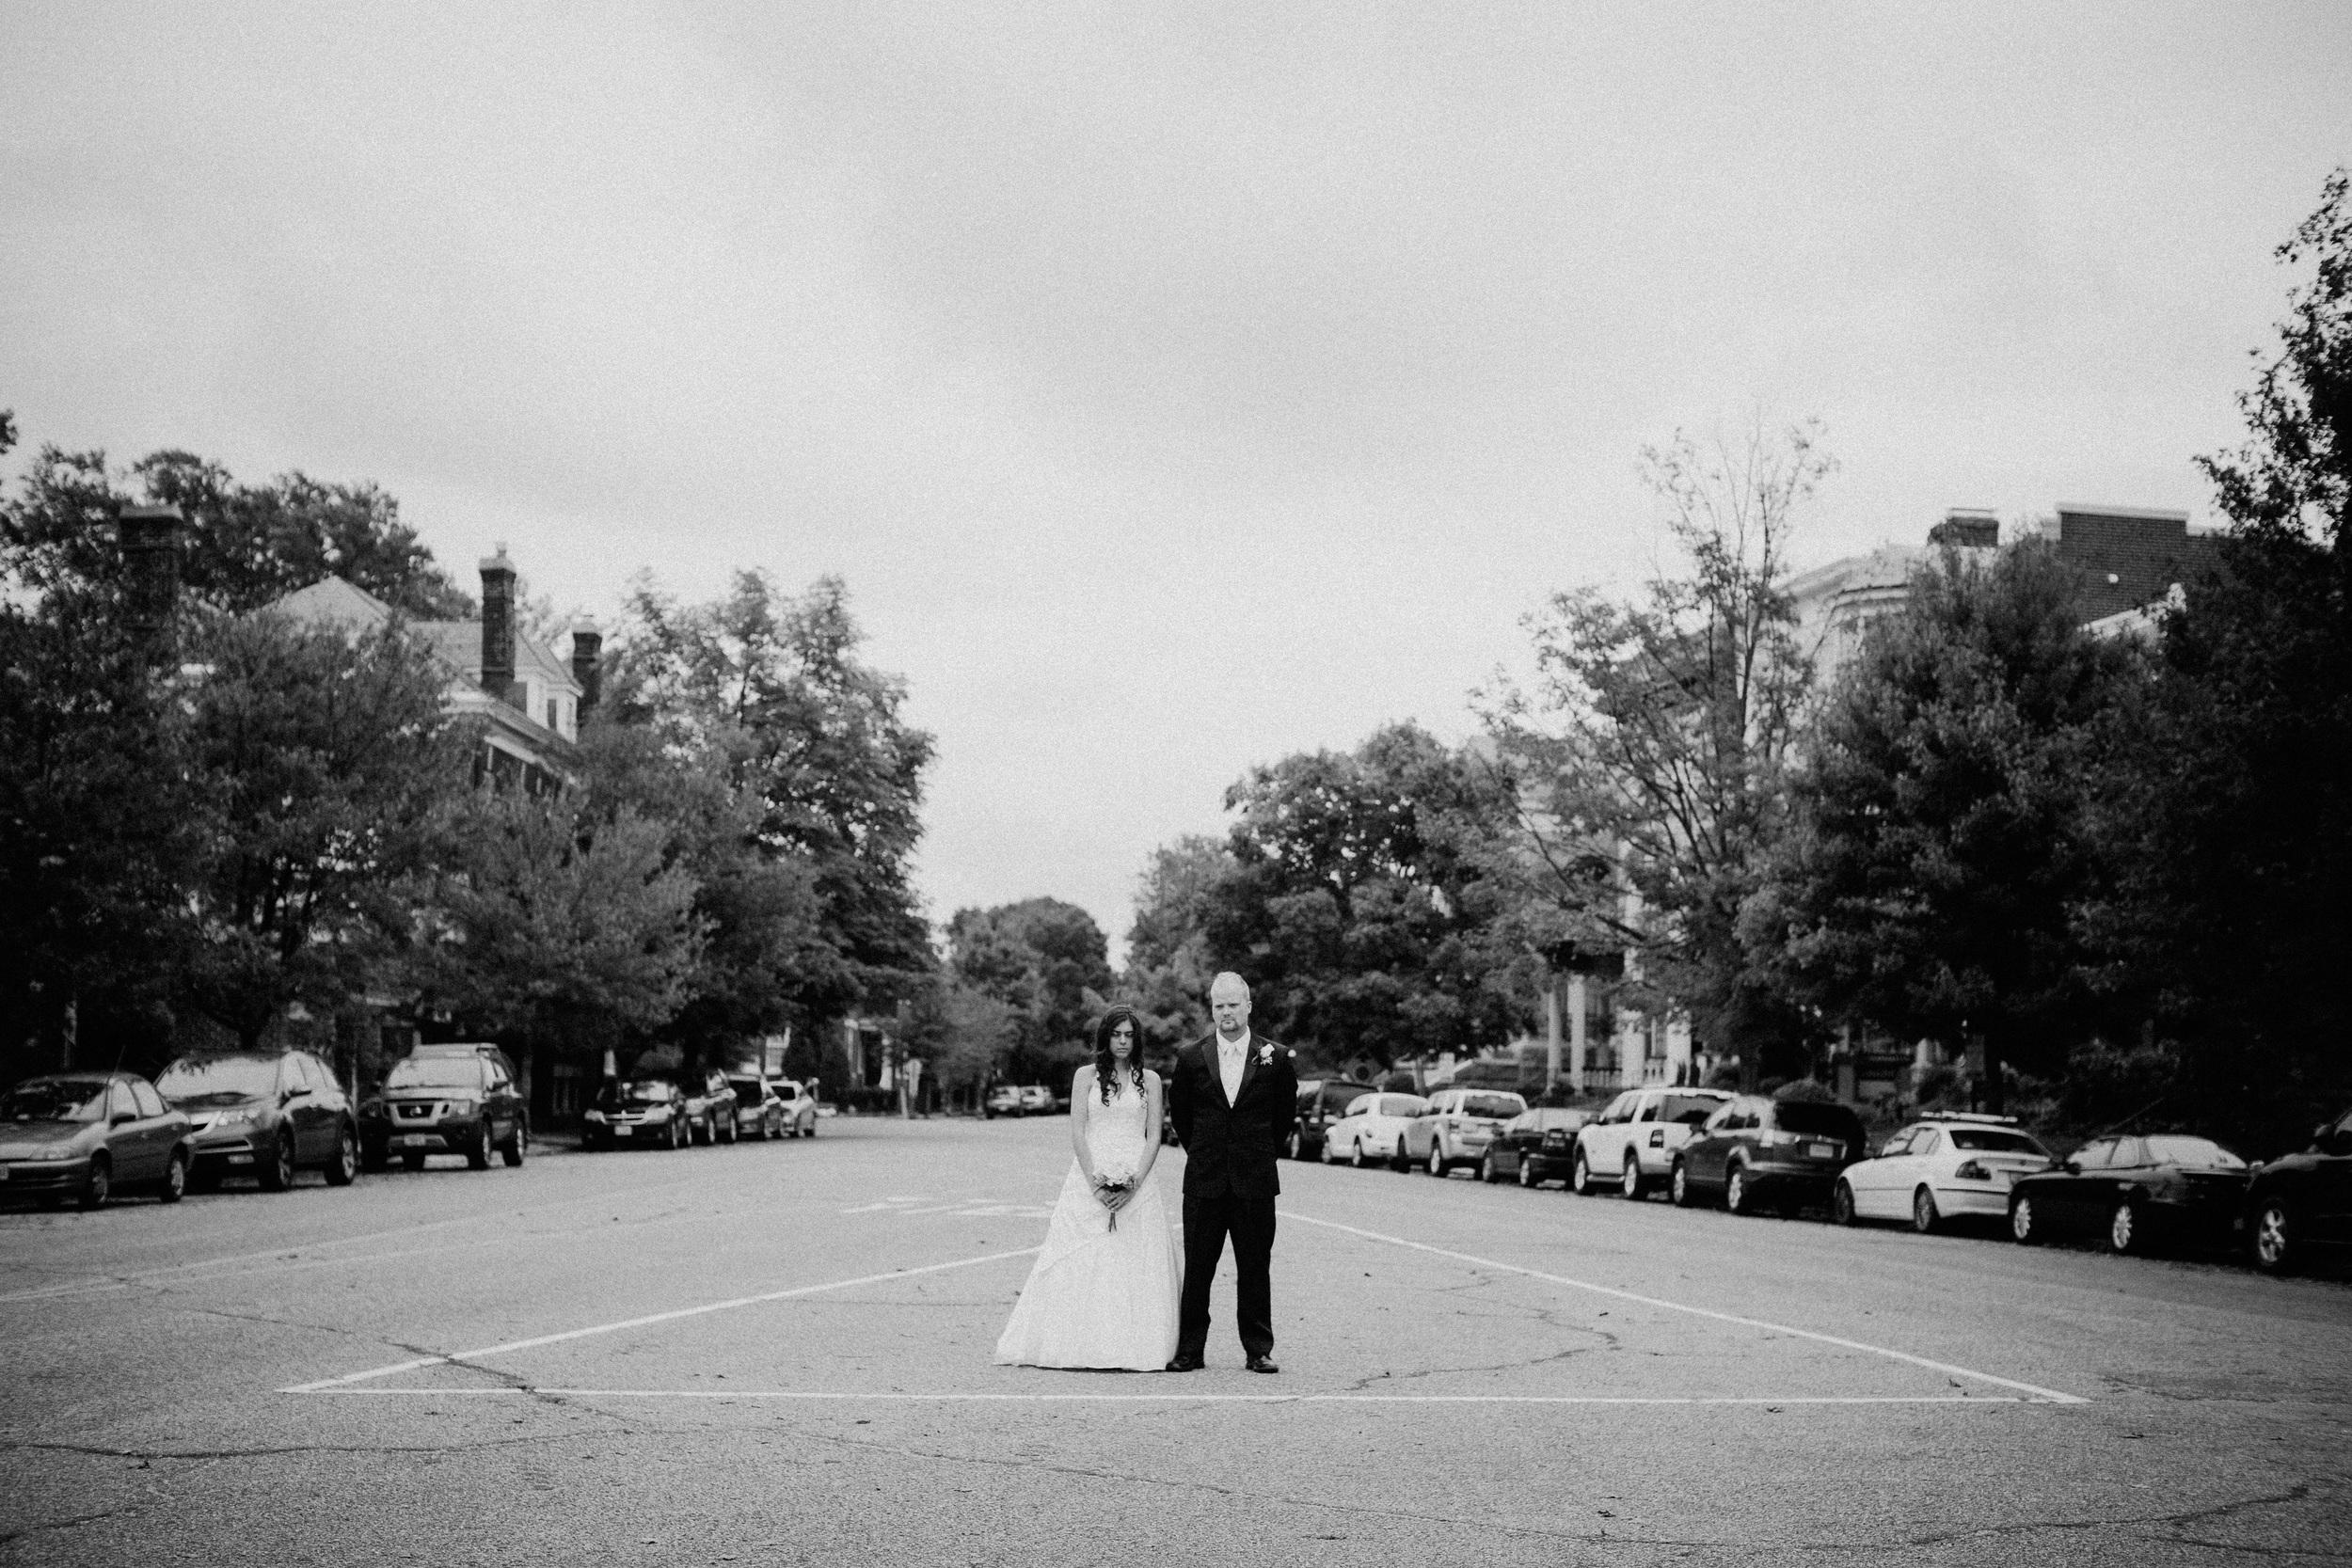 ben-and-blair-wedding-9761.jpg